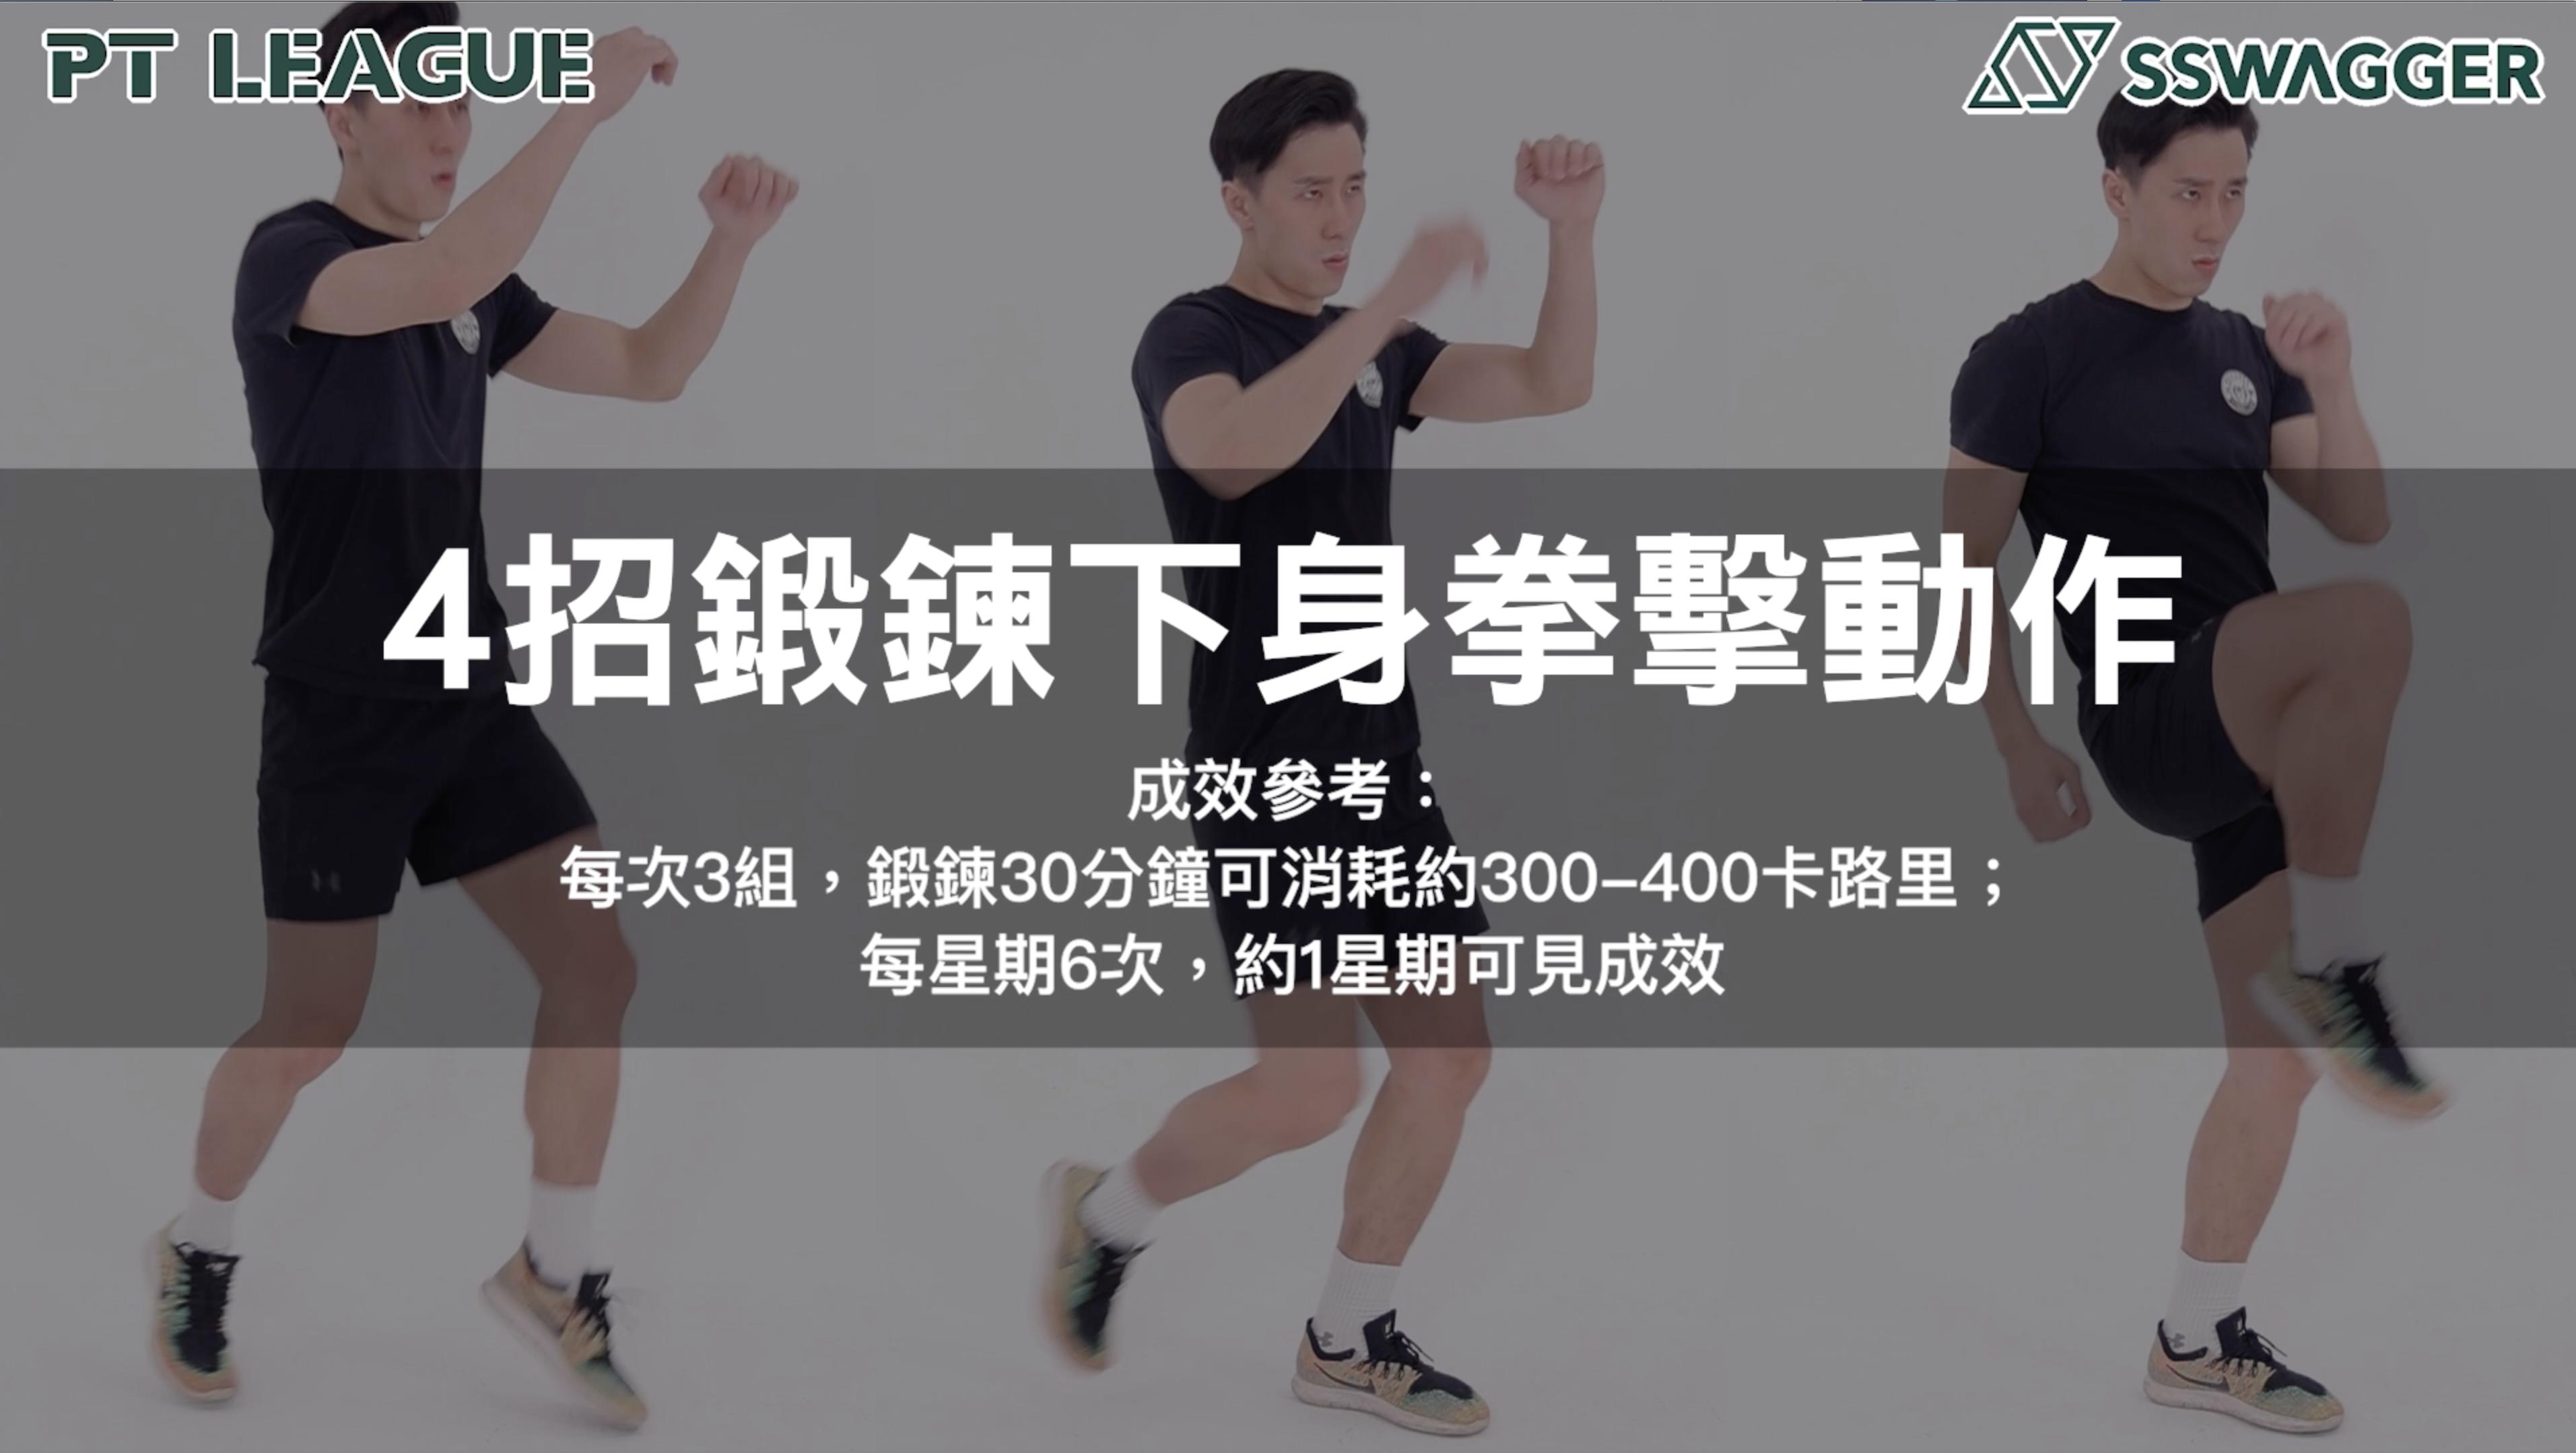 【SSwagger Academy - PT League】4招鍛鍊下身拳擊動作